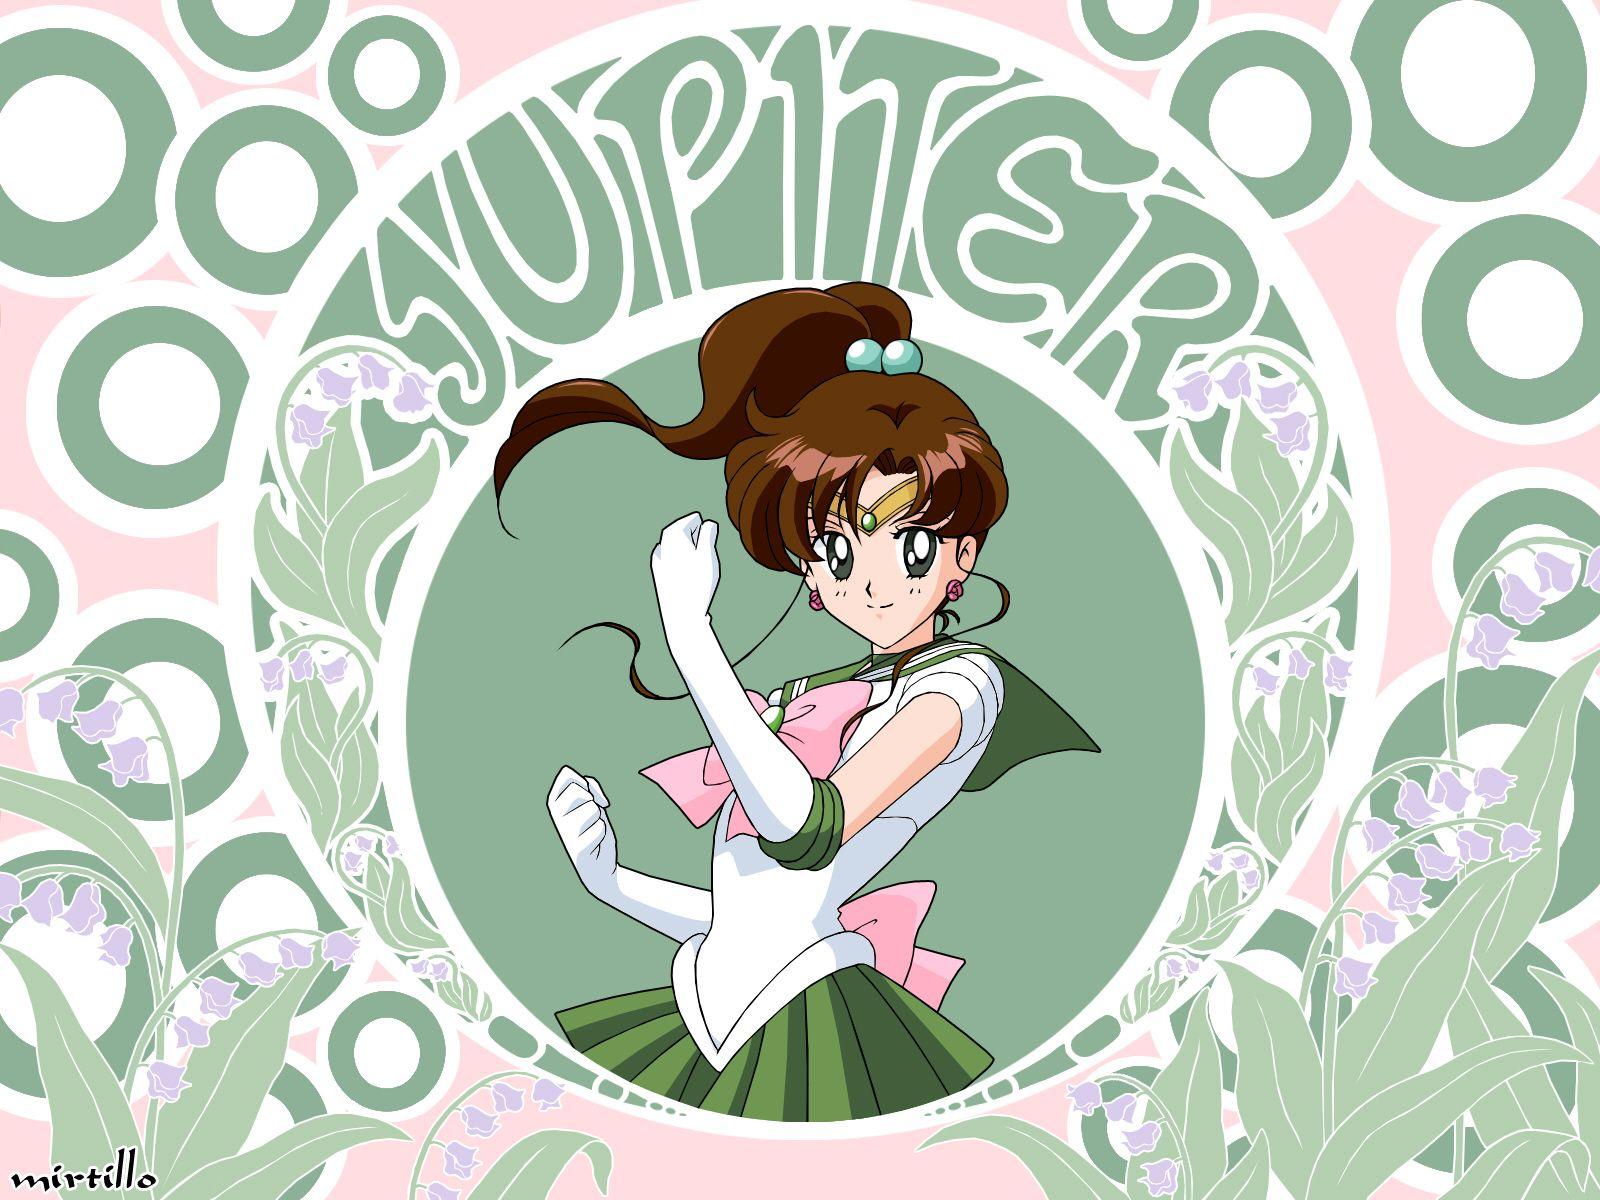 Sailor Jupiter 4ever Wallpaper Sailor Jupiter Wallpaper Sailor Moon Wallpaper Sailor Jupiter Sailor Moon Manga